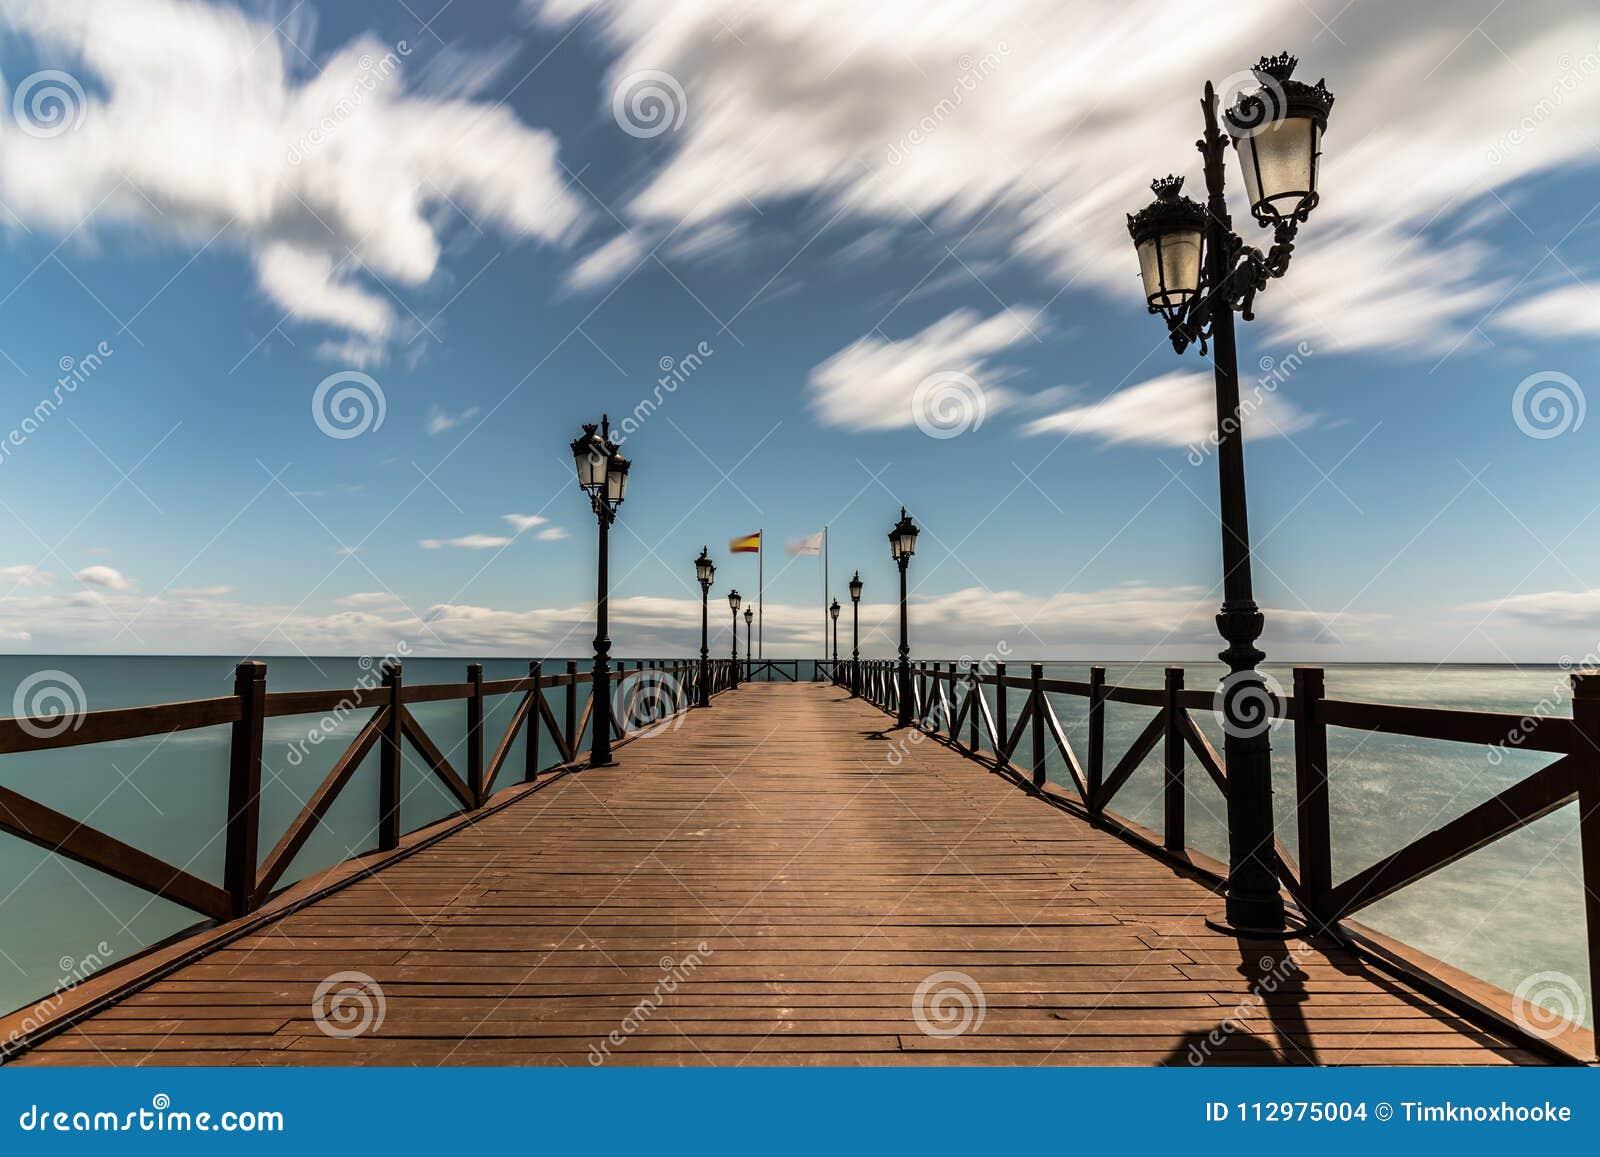 Pier on a beach in Marbella, Spain.